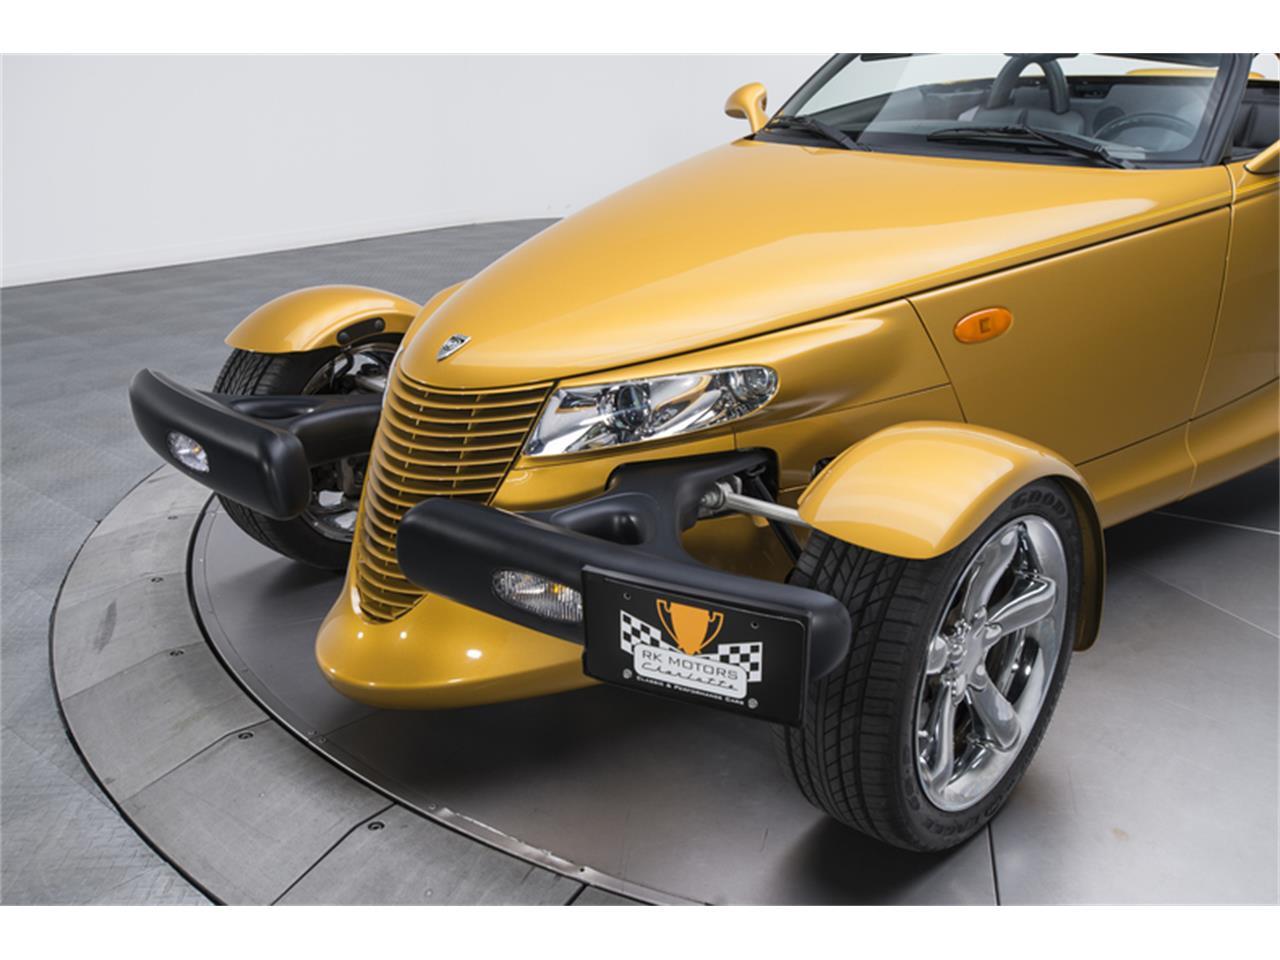 2002 Chrysler Prowler for Sale | ClassicCars.com | CC-986404